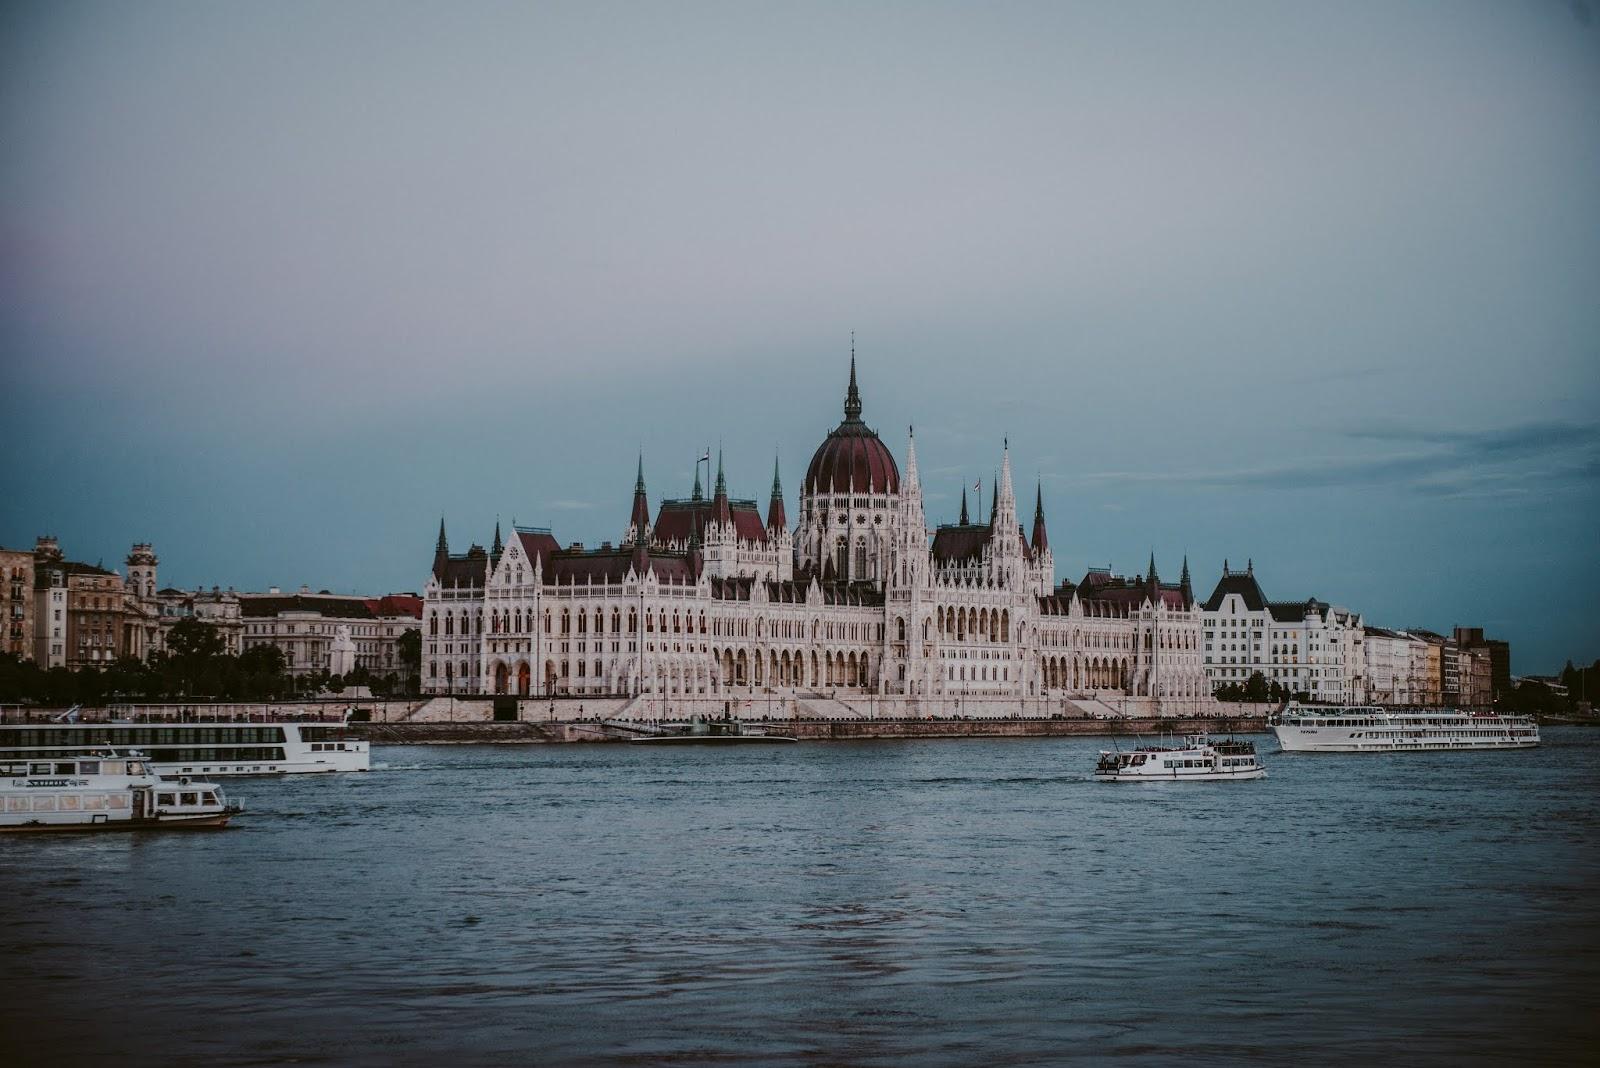 BUDAPESZT- NOCLEGI I INNE PRAKTYCZNE RADY